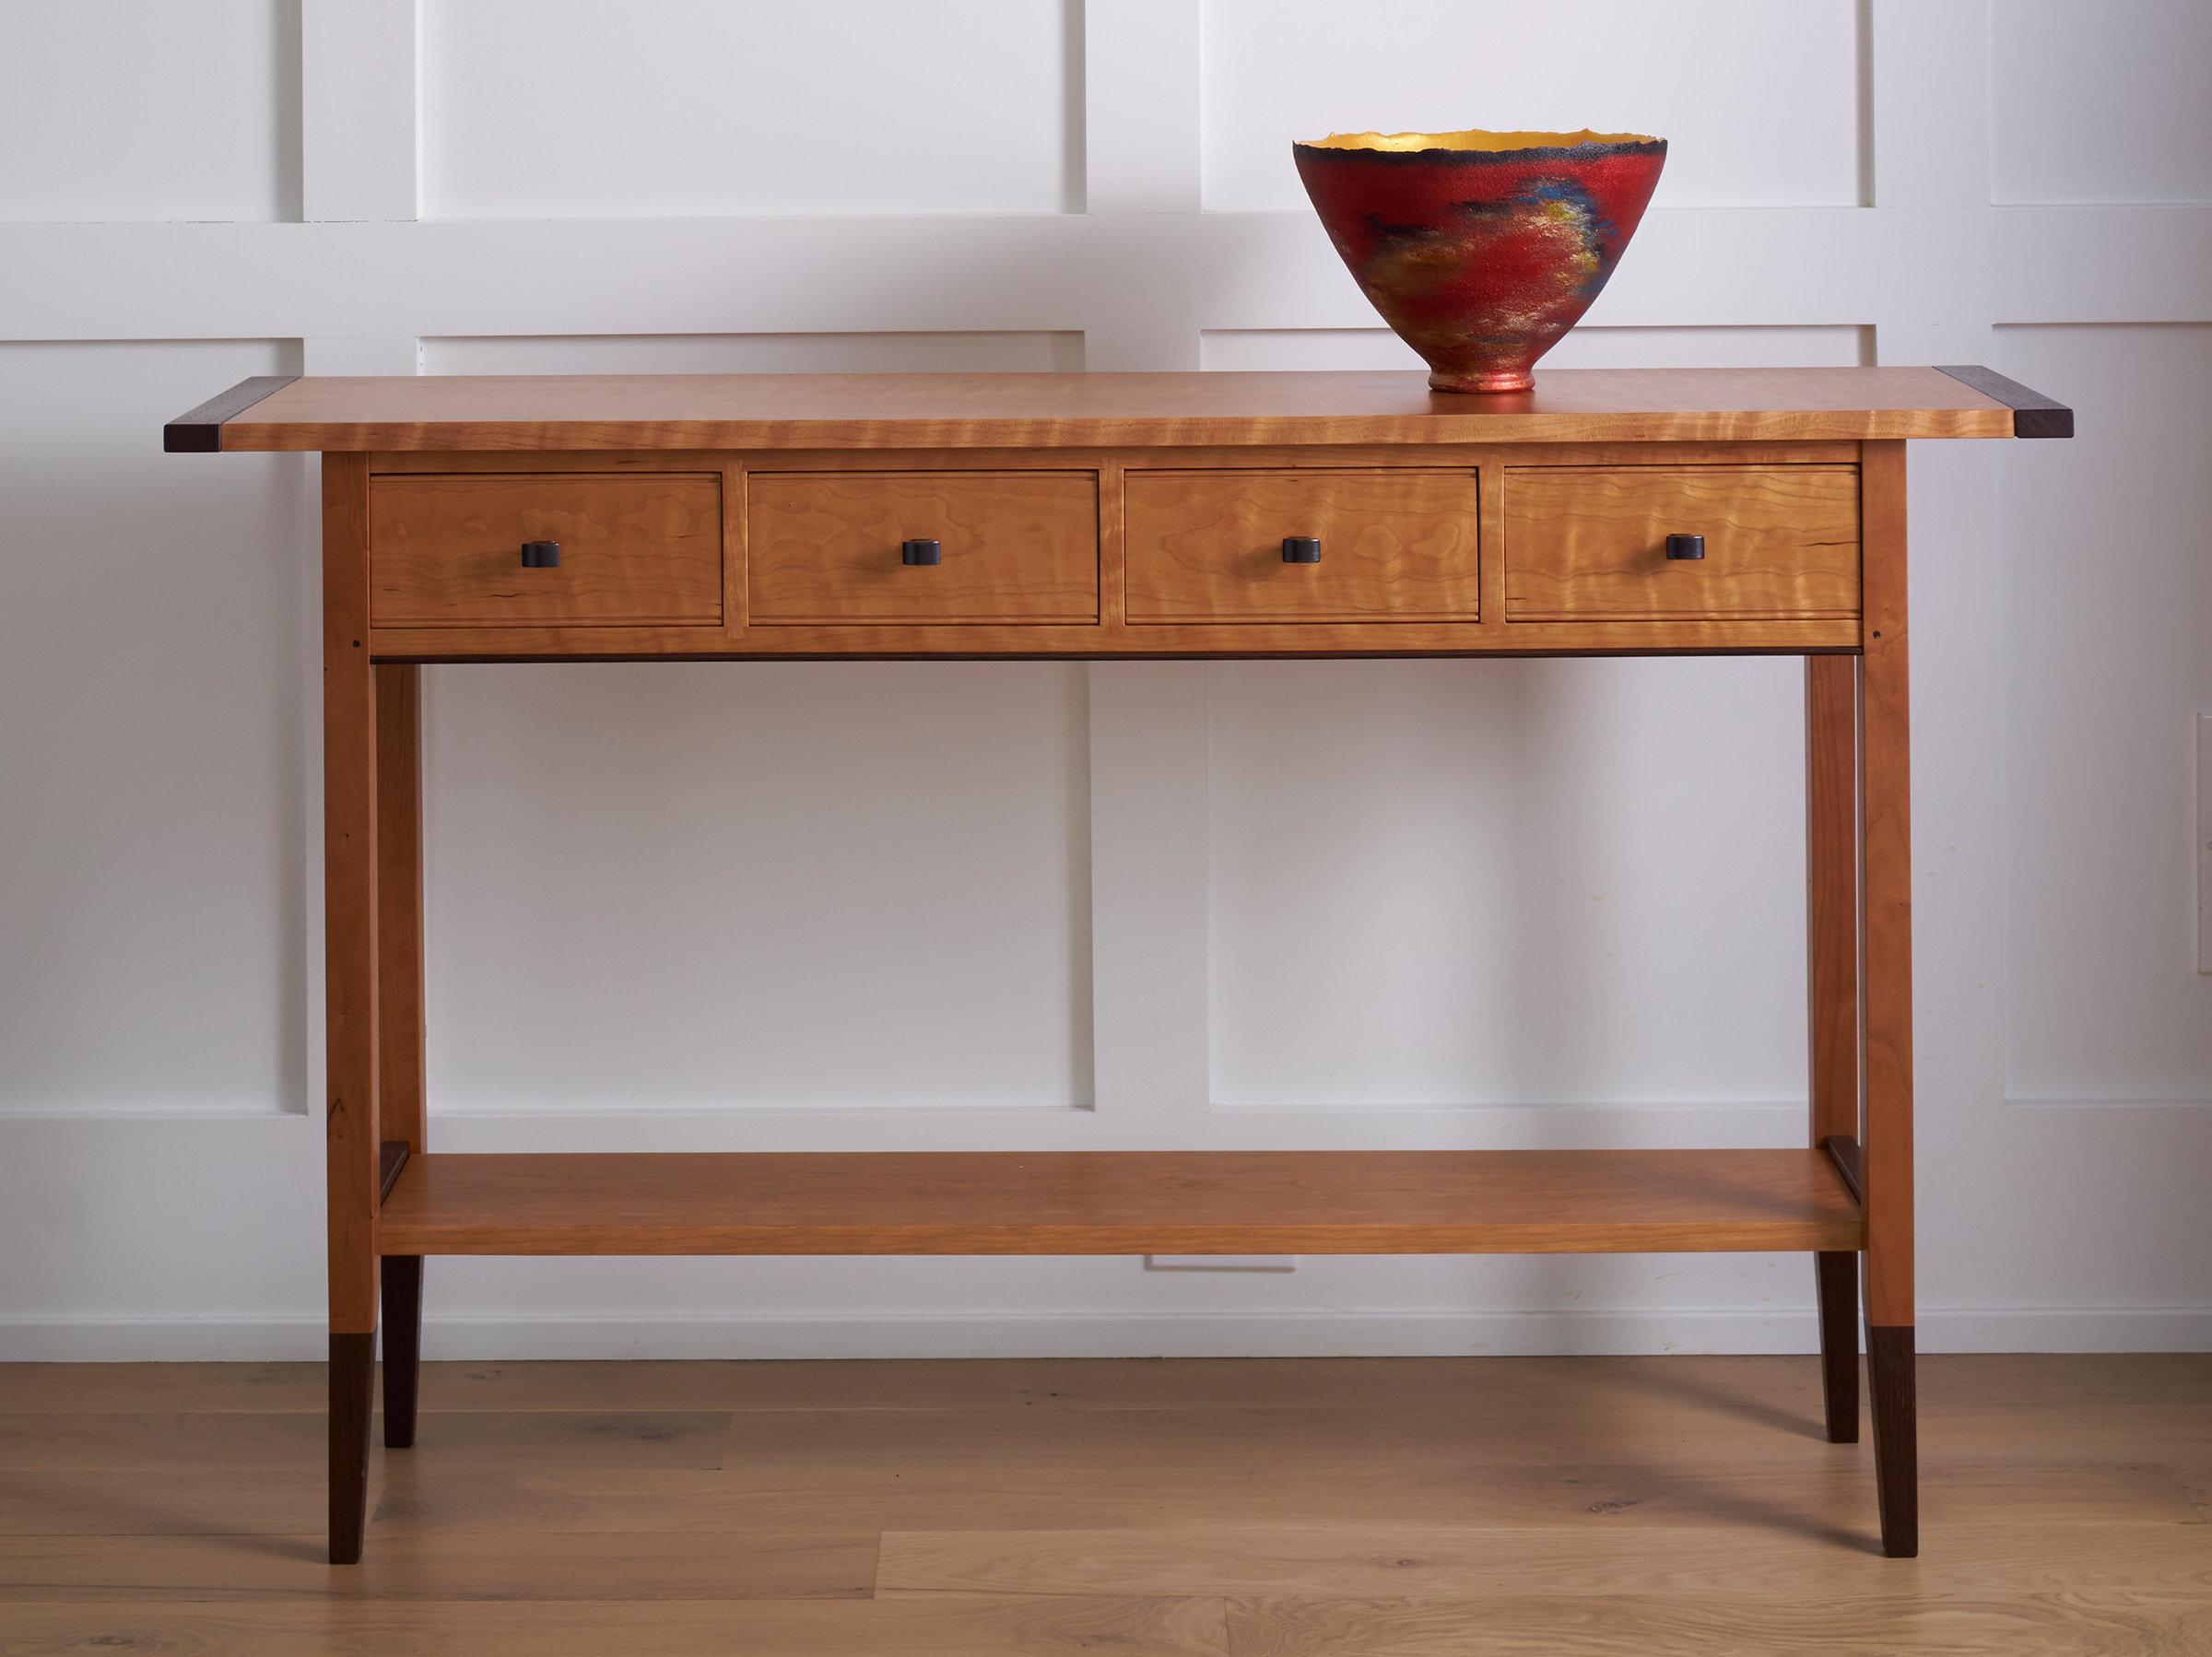 solid cherry sofa table u love thousand oaks ca by tom dumke wood console